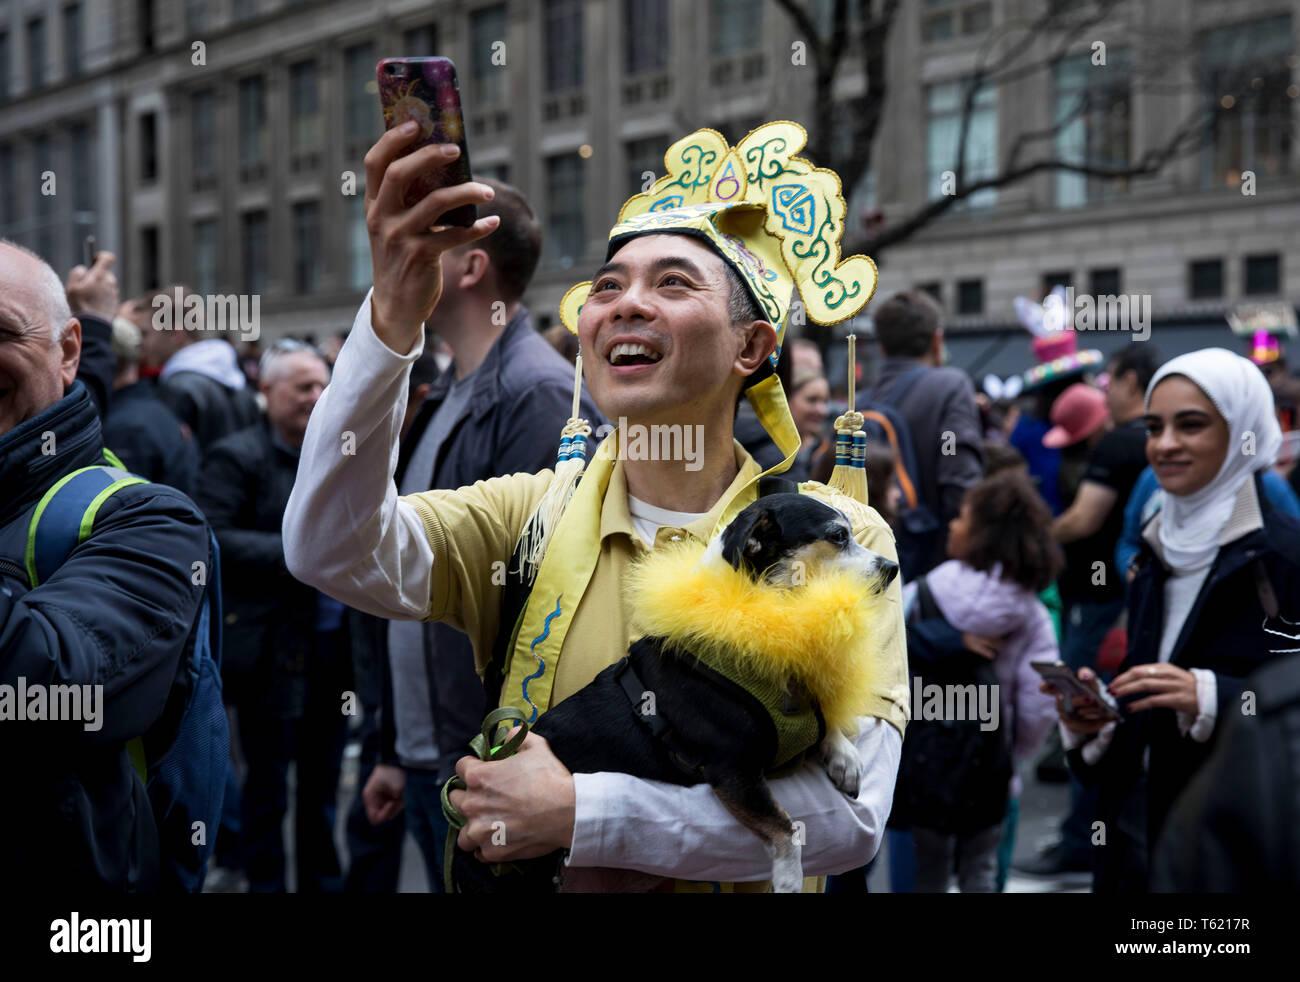 Beijing, USA  21st Apr, 2019  A costumed man holding a dog